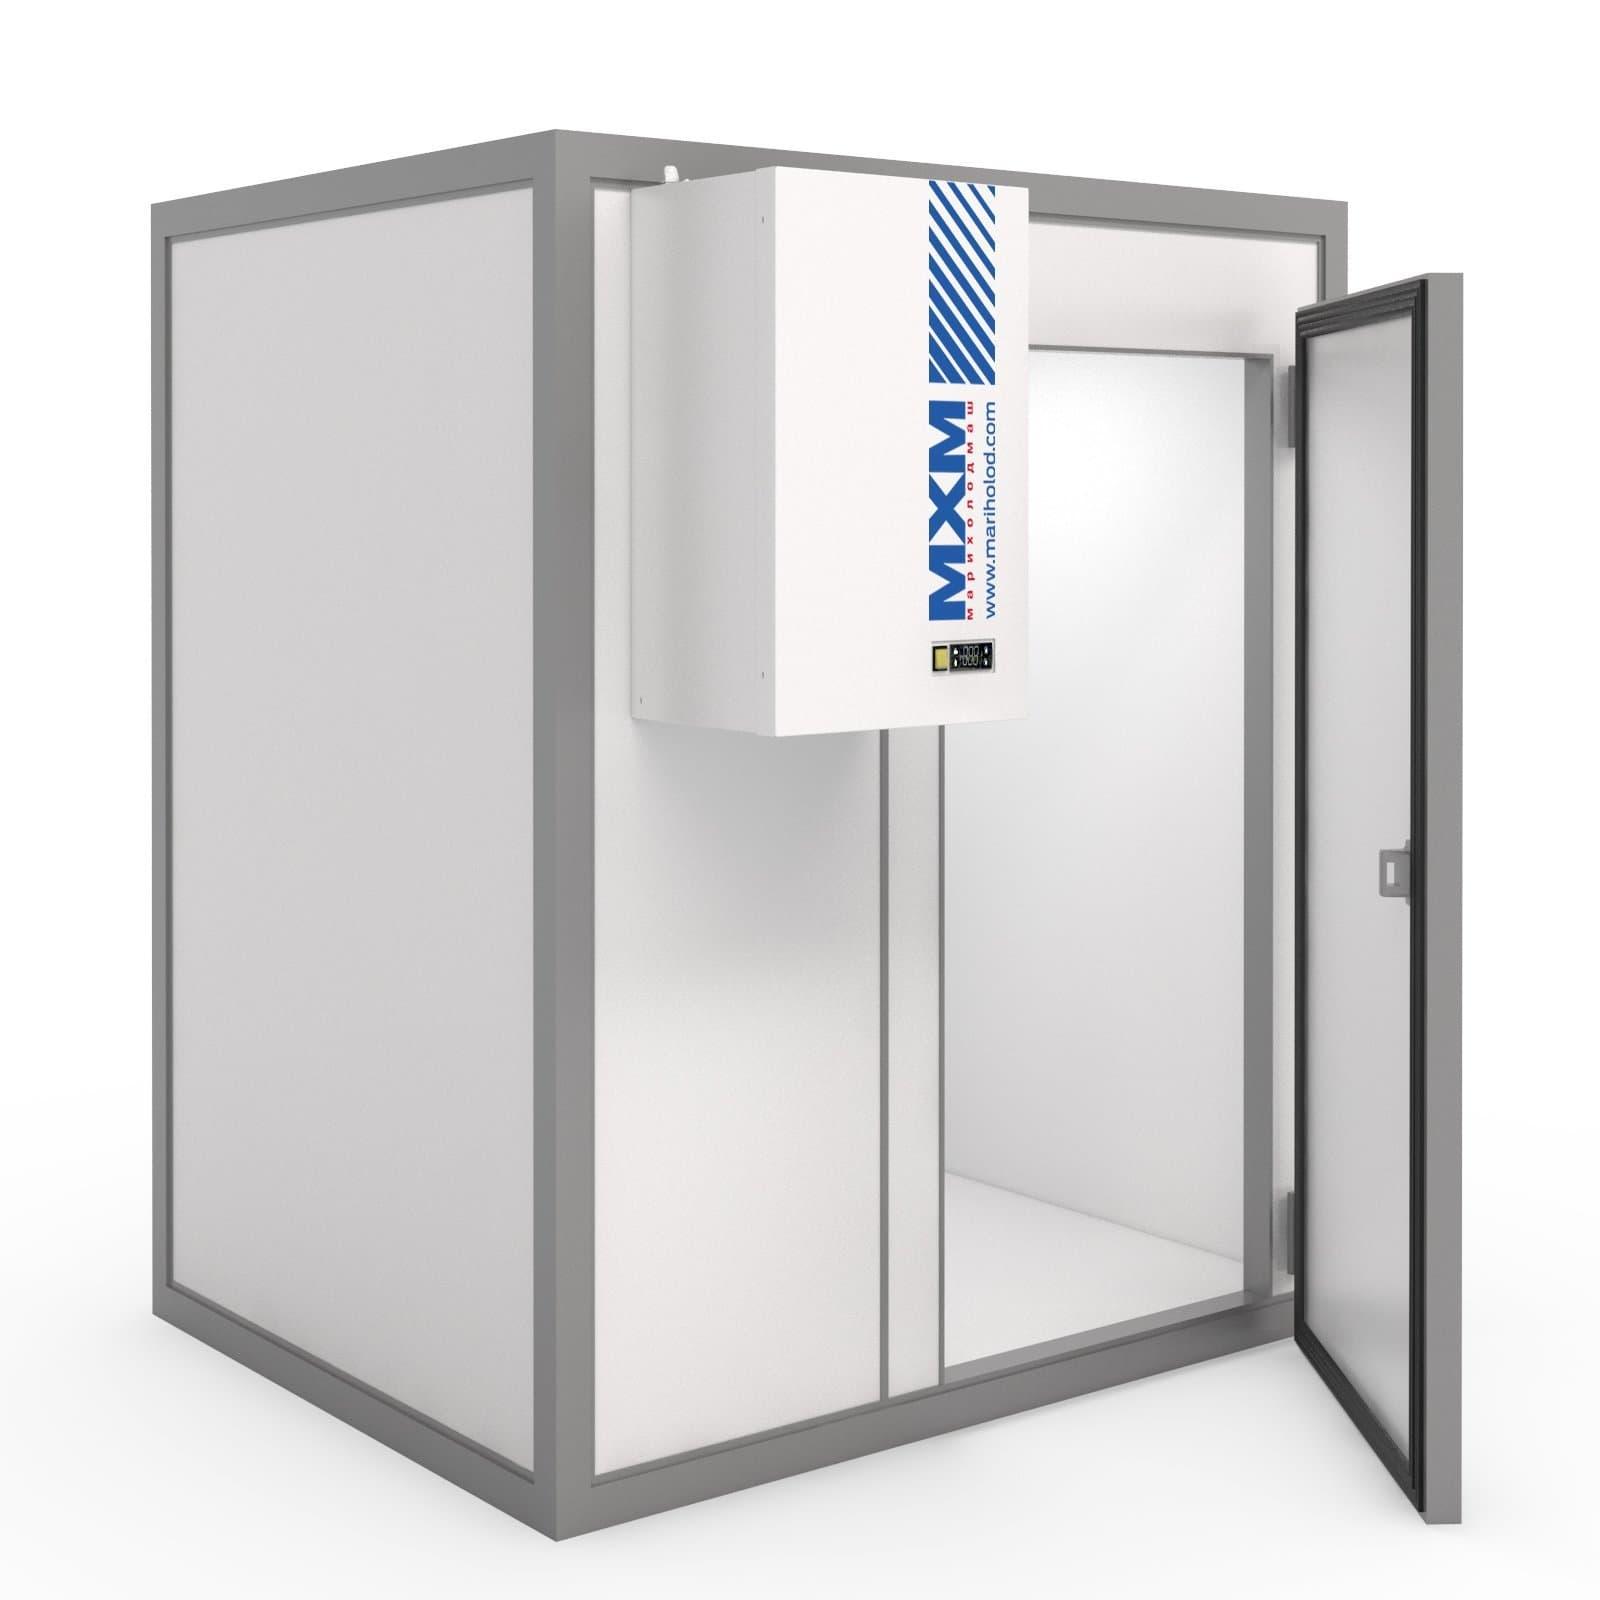 Камера холодильная КХН-76,18 (2560×13960×2460 мм)